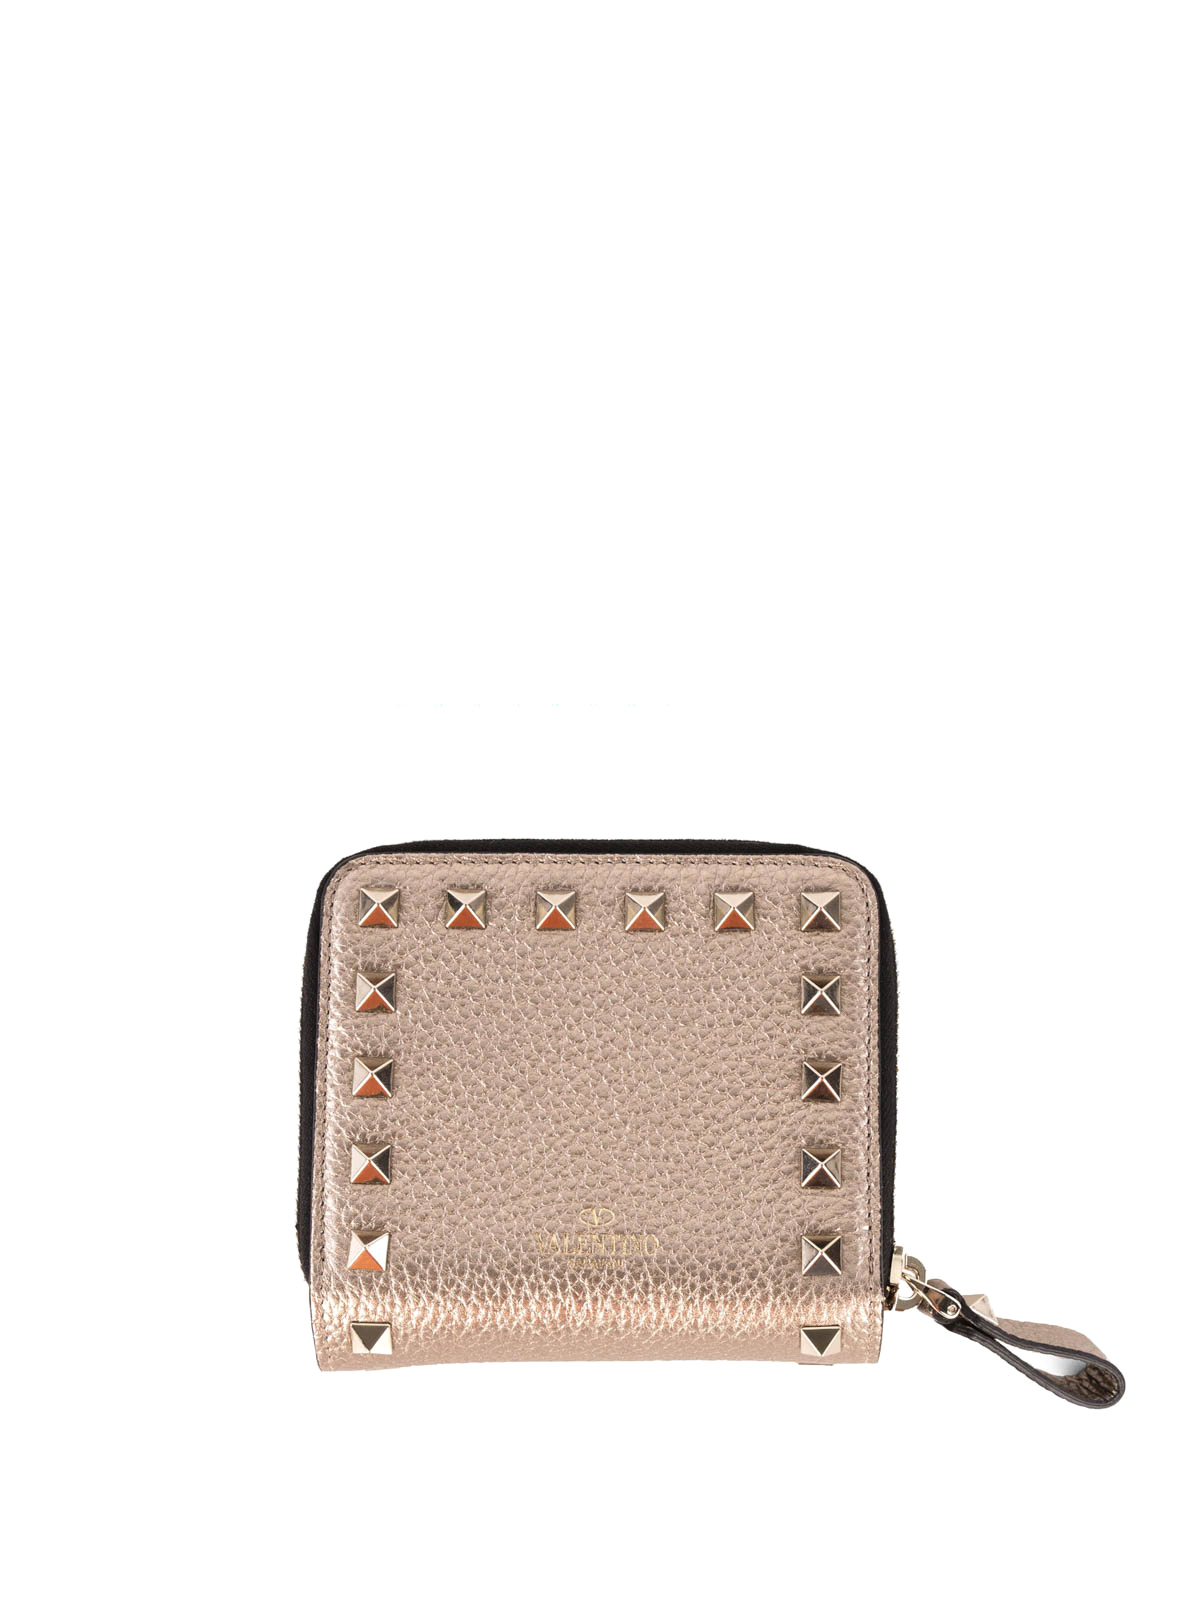 Valentino Garavani - Rockstud laminated leather wallet - wallets & purses - LW2P0649VUE S69